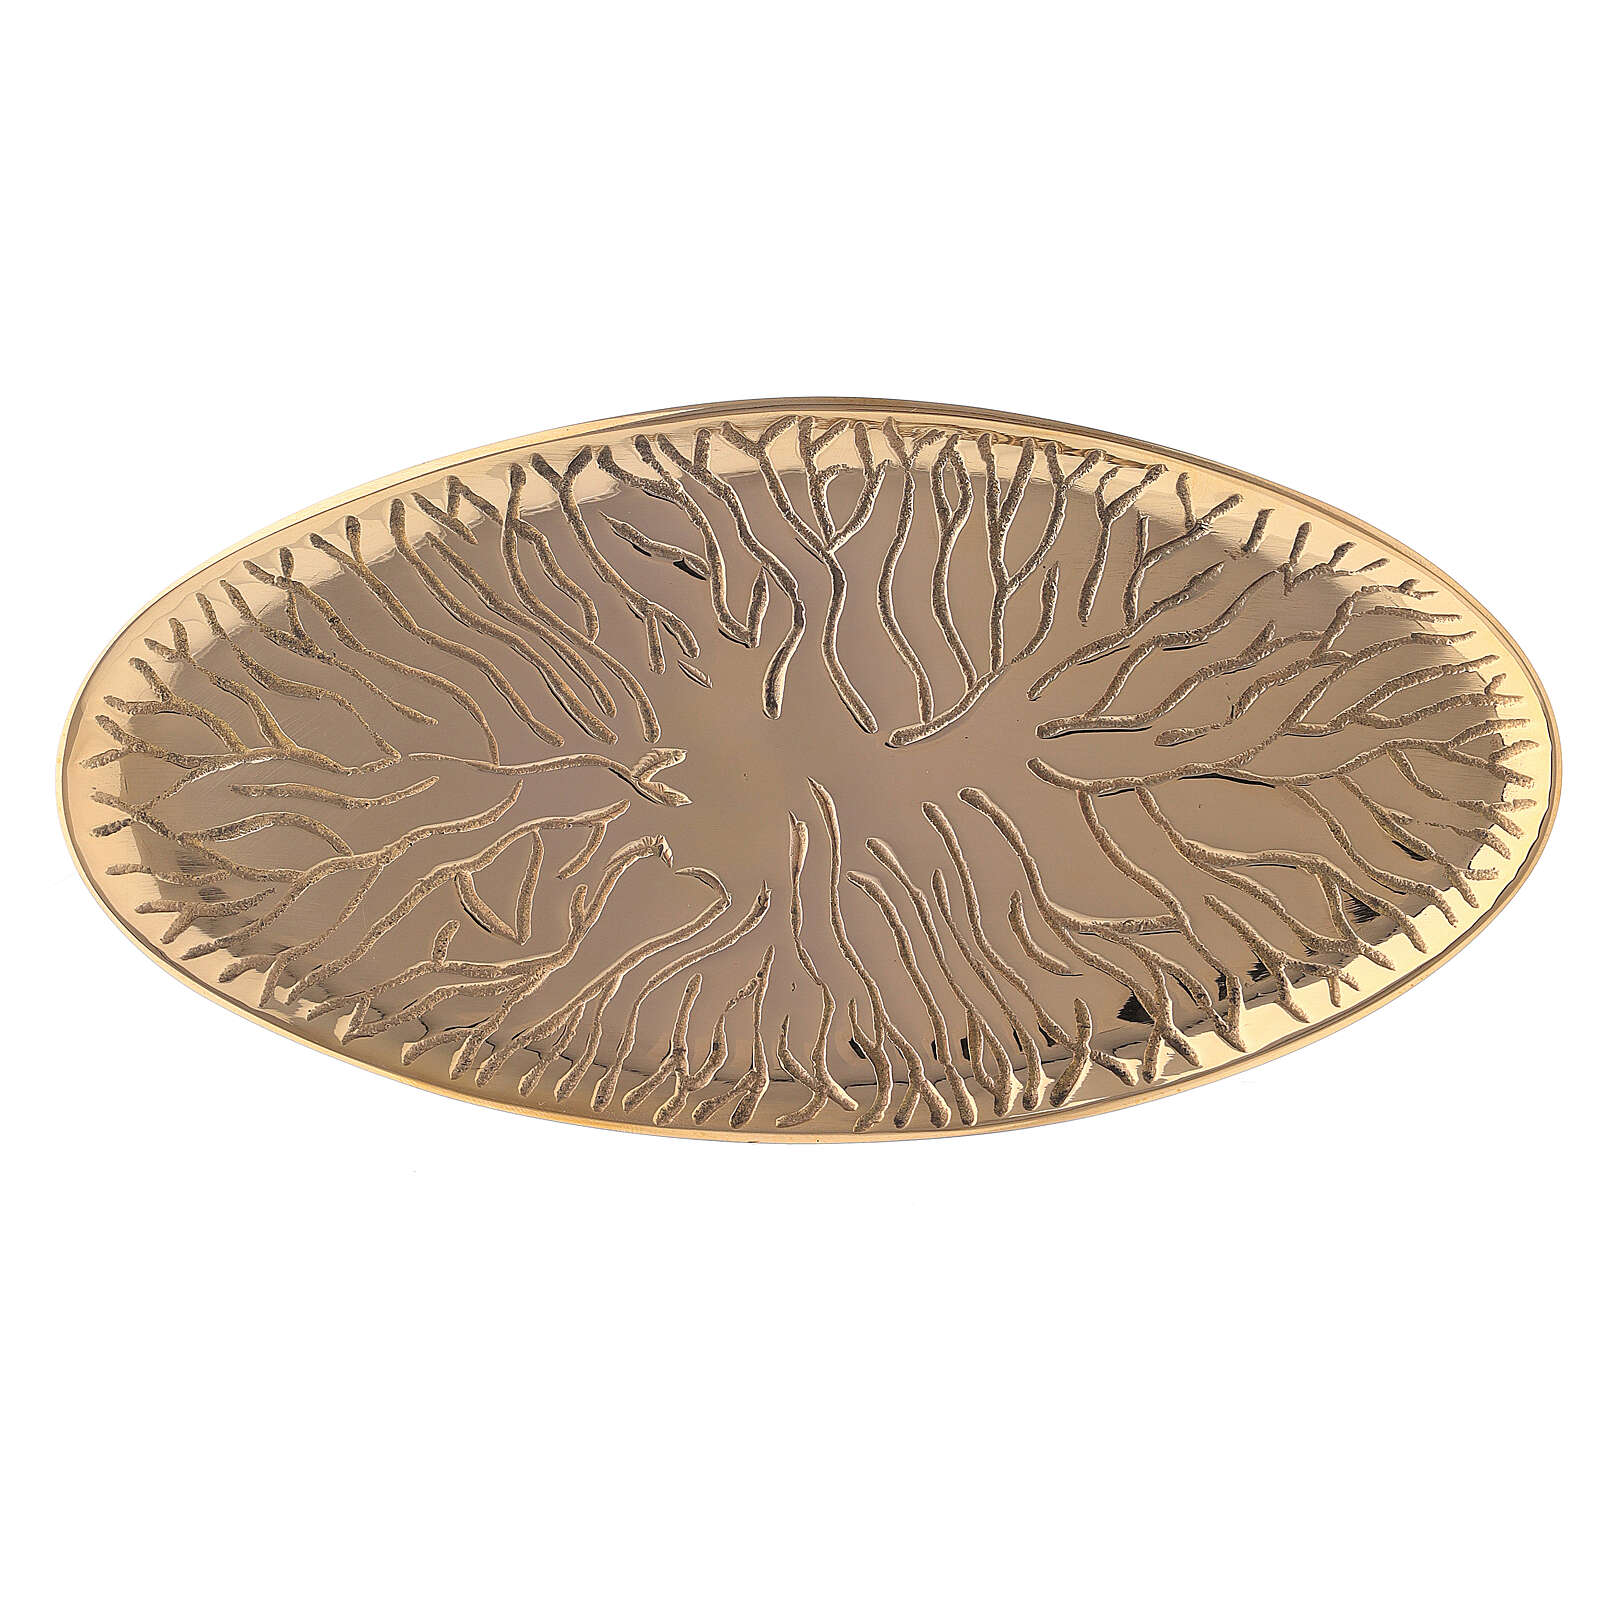 Prato porta-círio oval latão dourado desenho raízes 18x9 cm 3